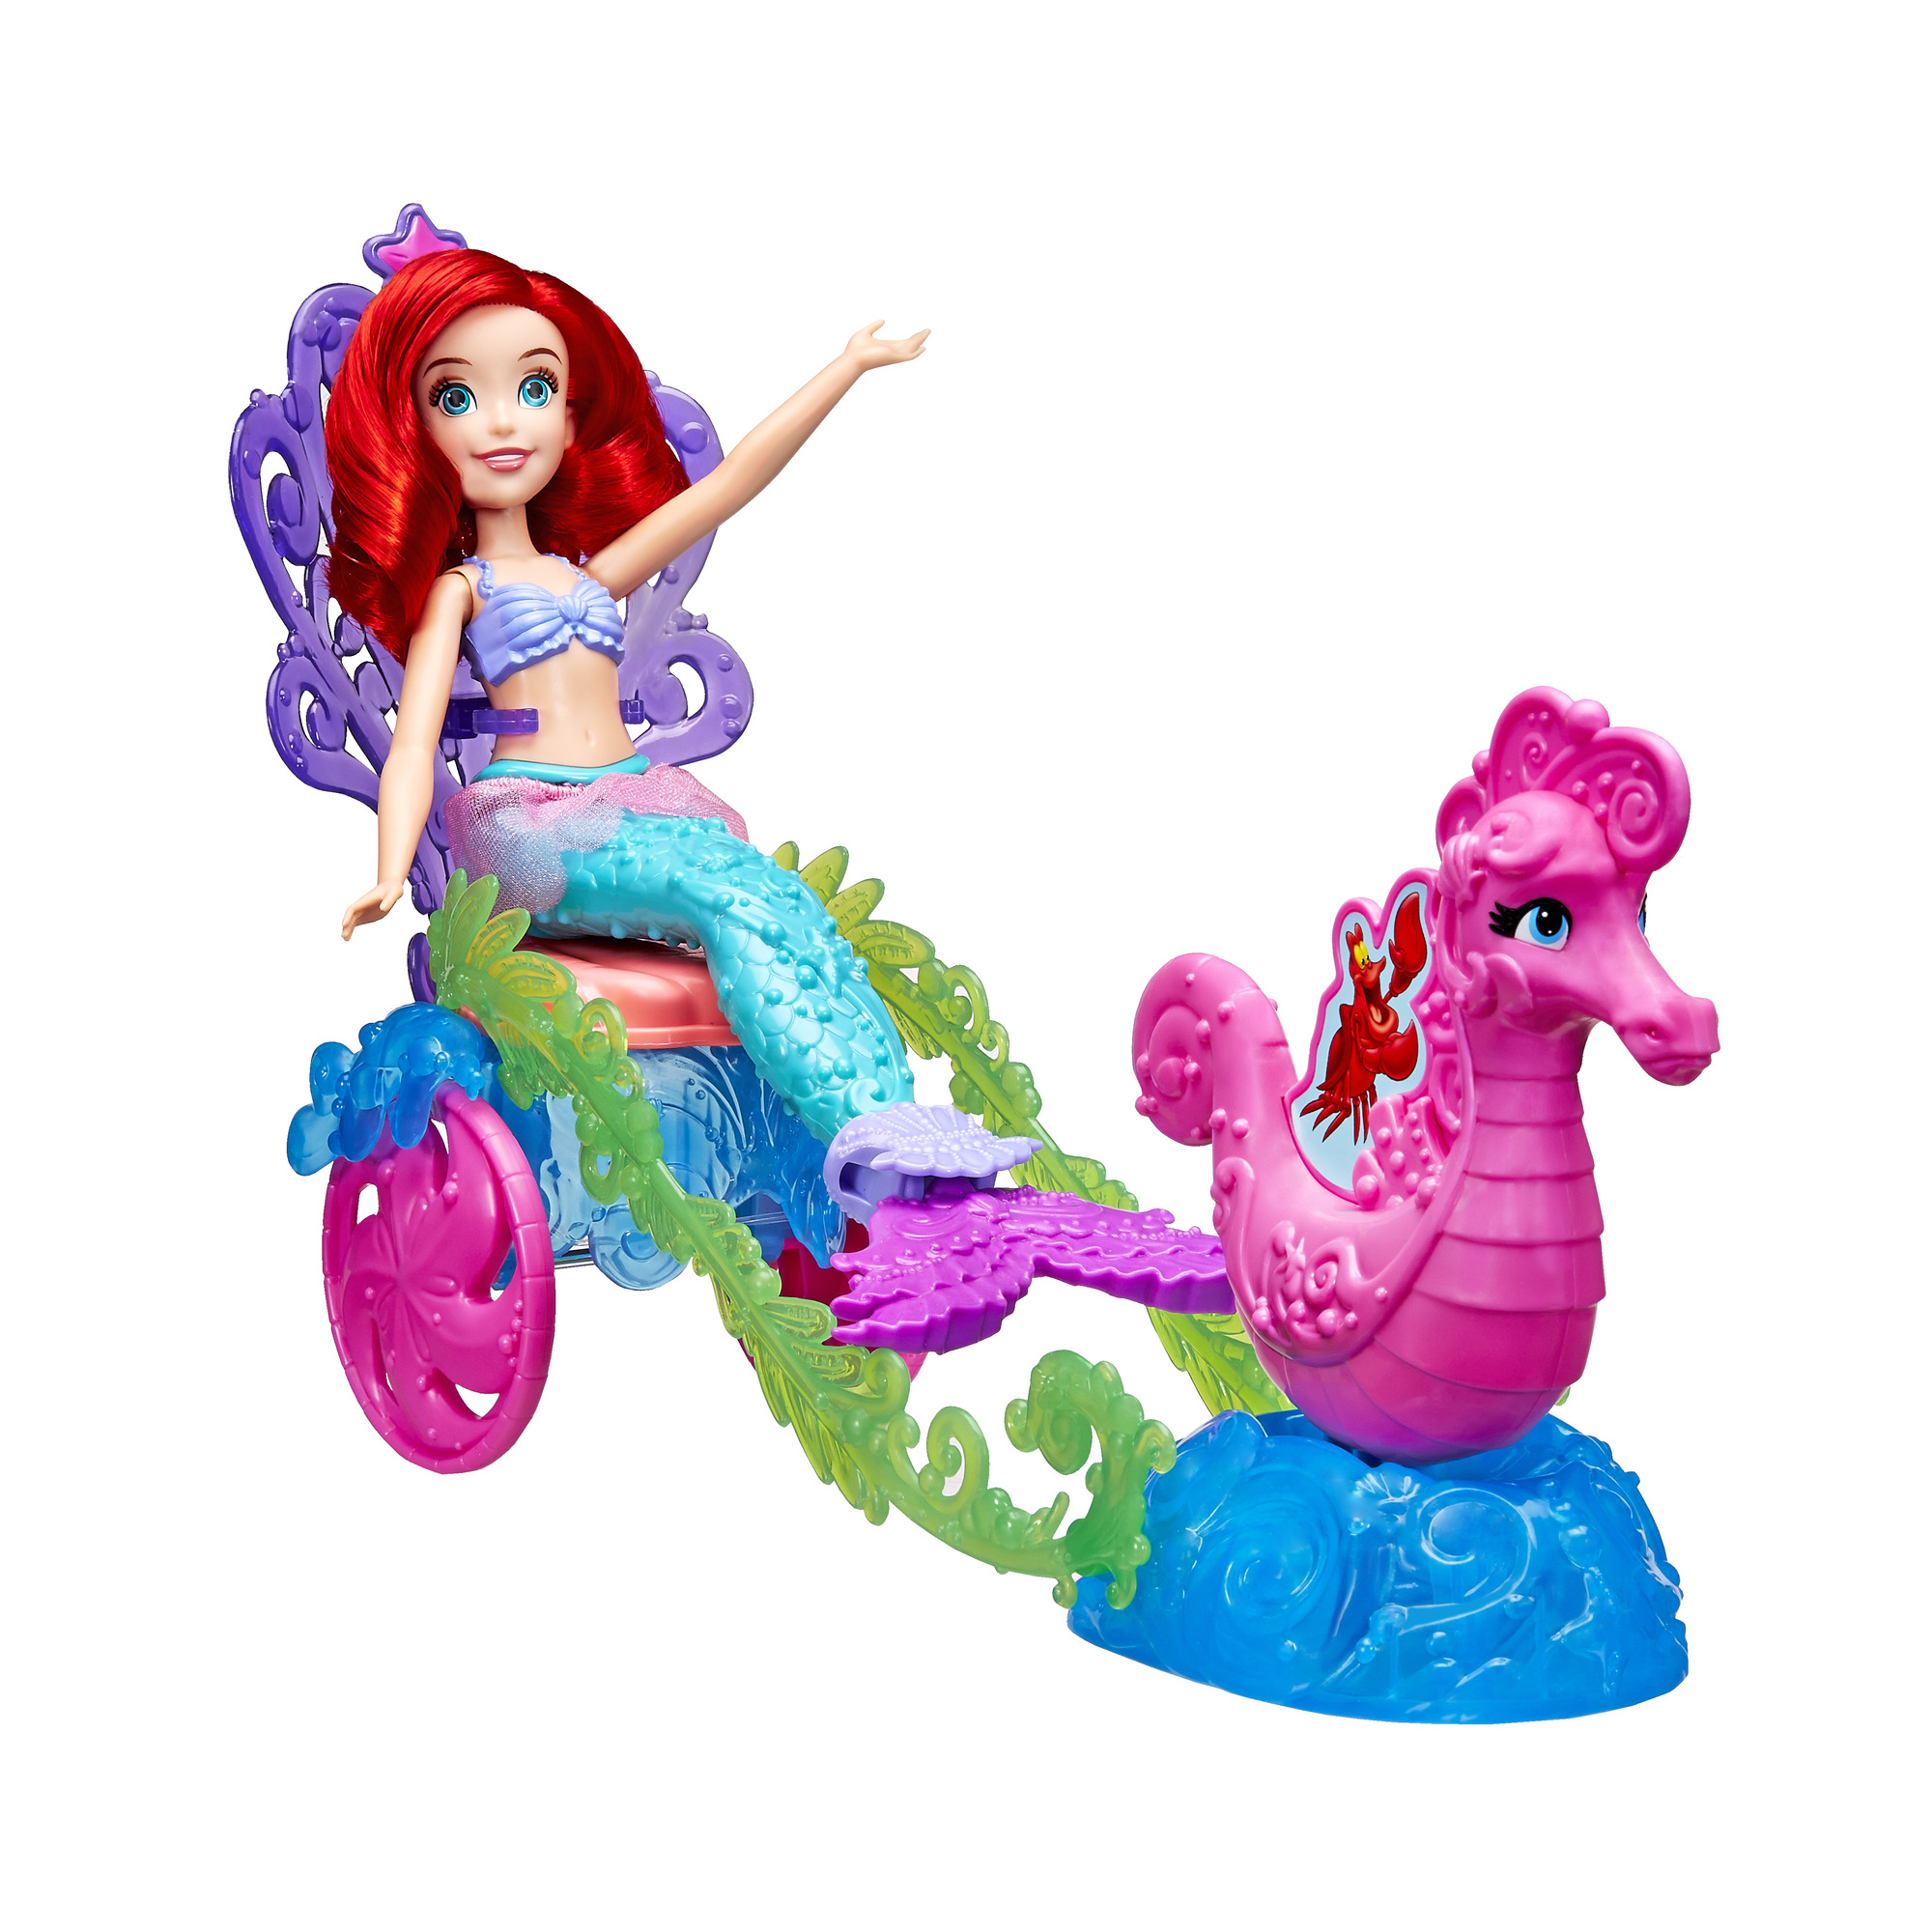 Disney Princess Ariel's Under the Sea Carriage by Hasbro